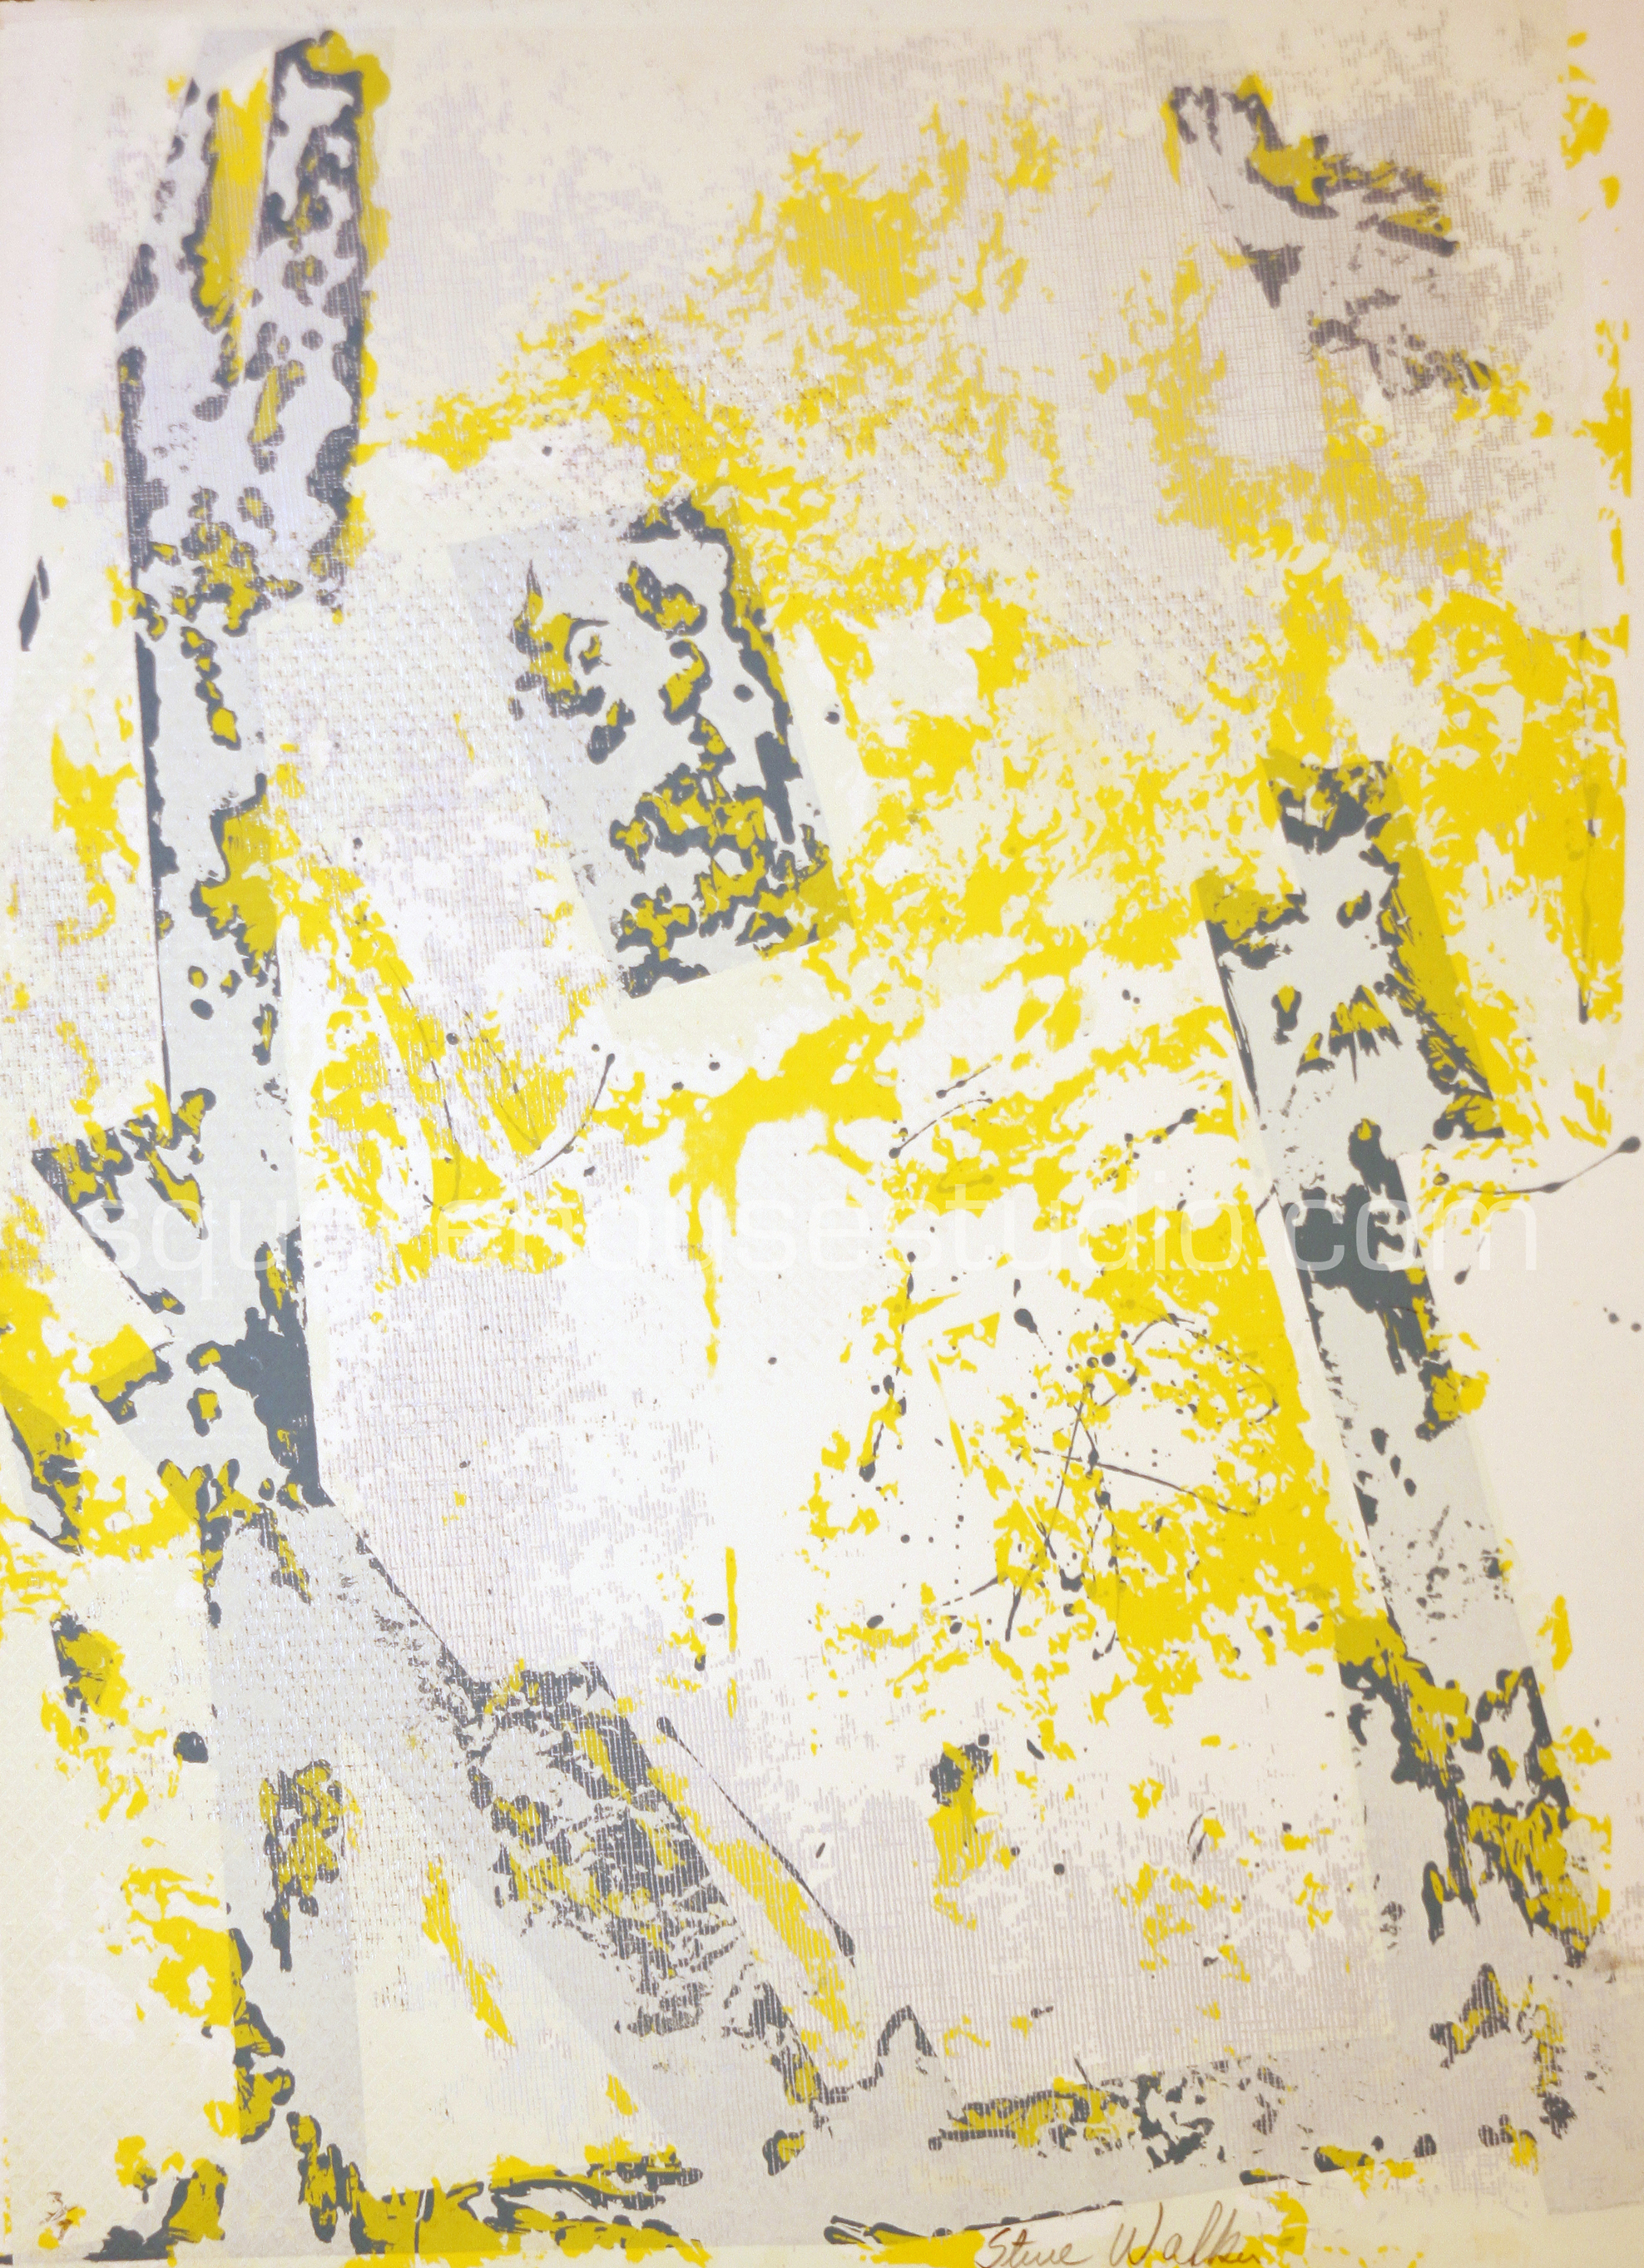 "Textured Window , 22"" x 32,"" original edition, $625 framed / $475 unframed, Available as giclée print—$450 framed / $300 unframed"